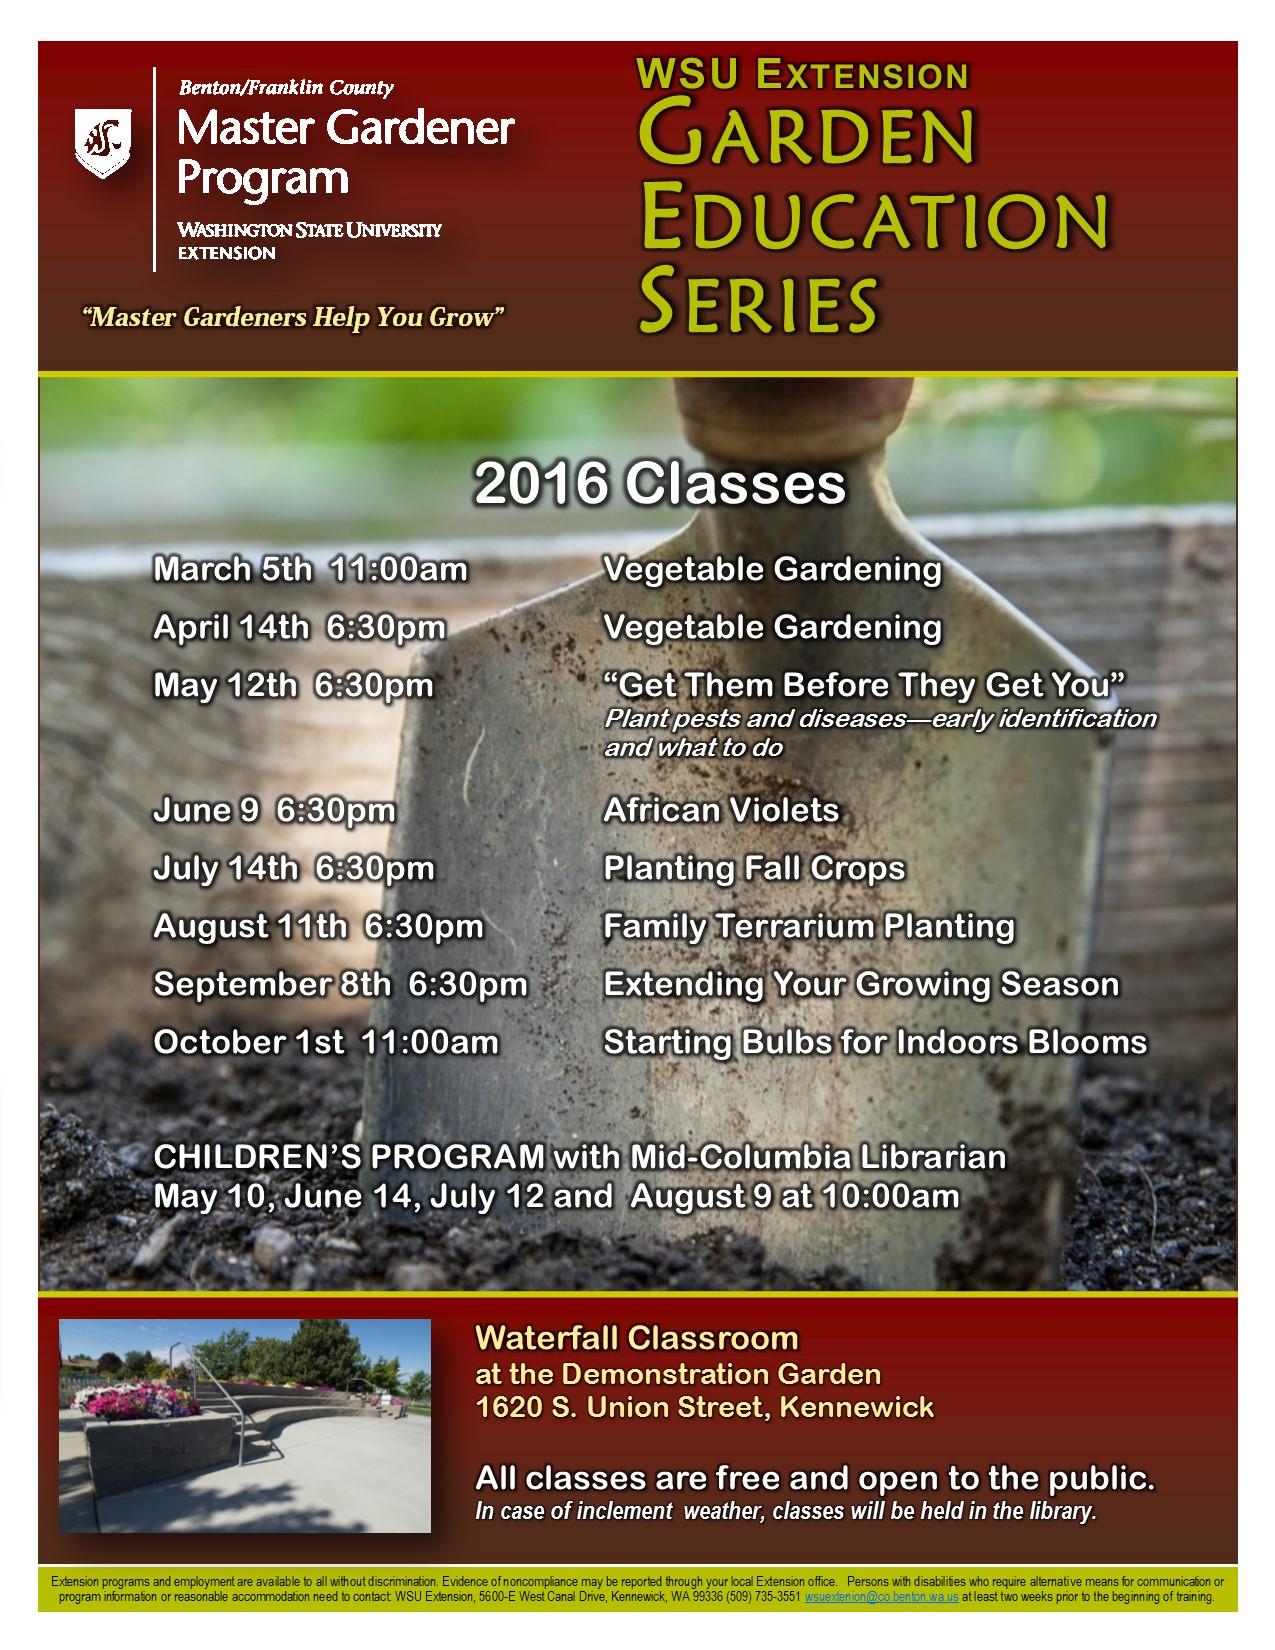 Garden Education Series Class Schedule